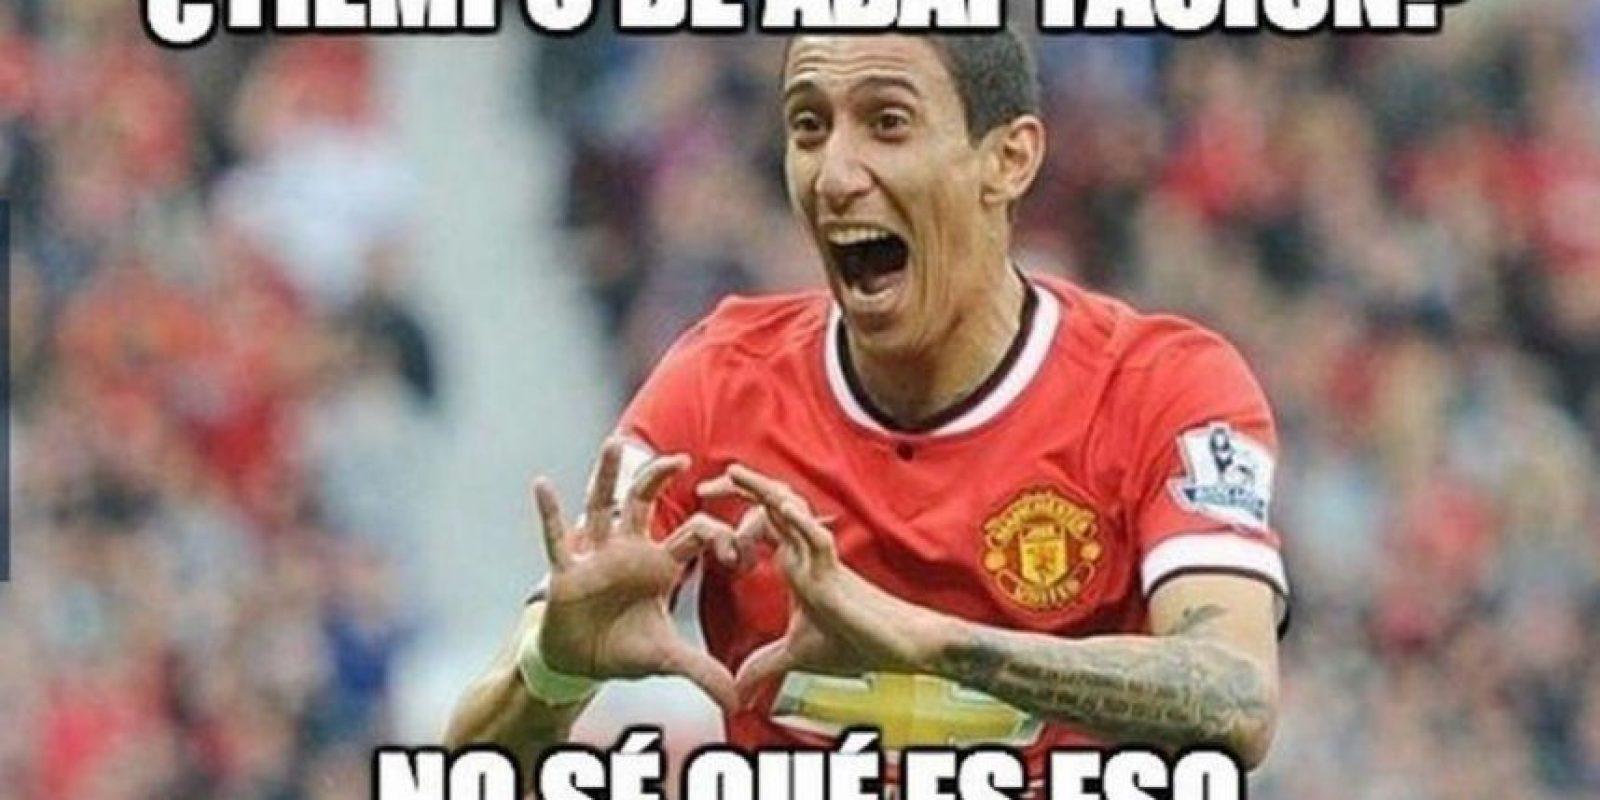 El 26 de agosto, Ángel Di María llegó al Manchester United Foto:Twitter